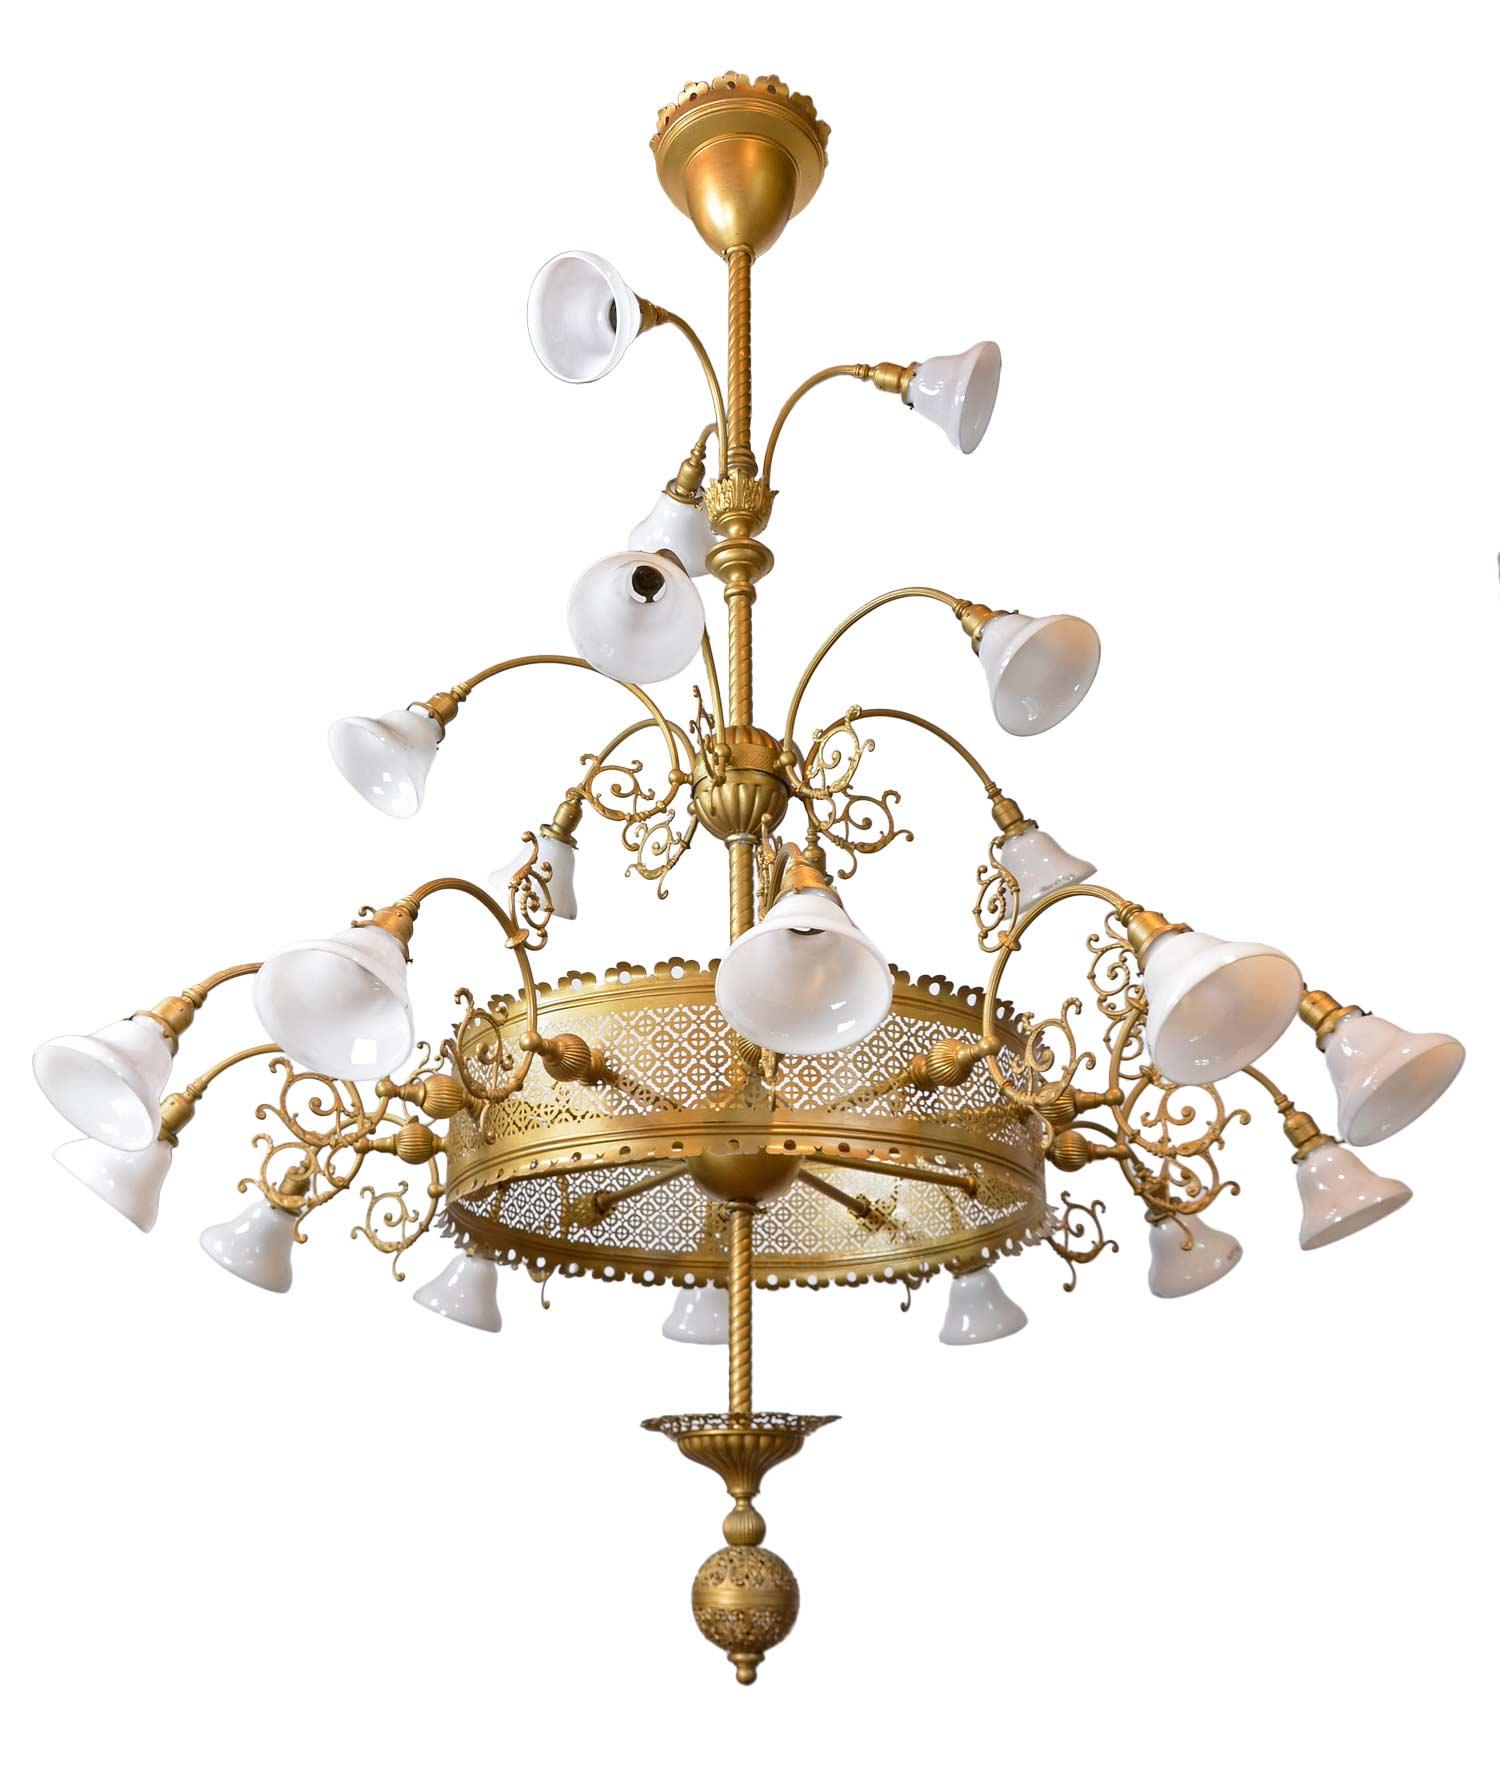 46128-oversized-20-light-3-tier-victorian-brass-chandelie-angle.jpg